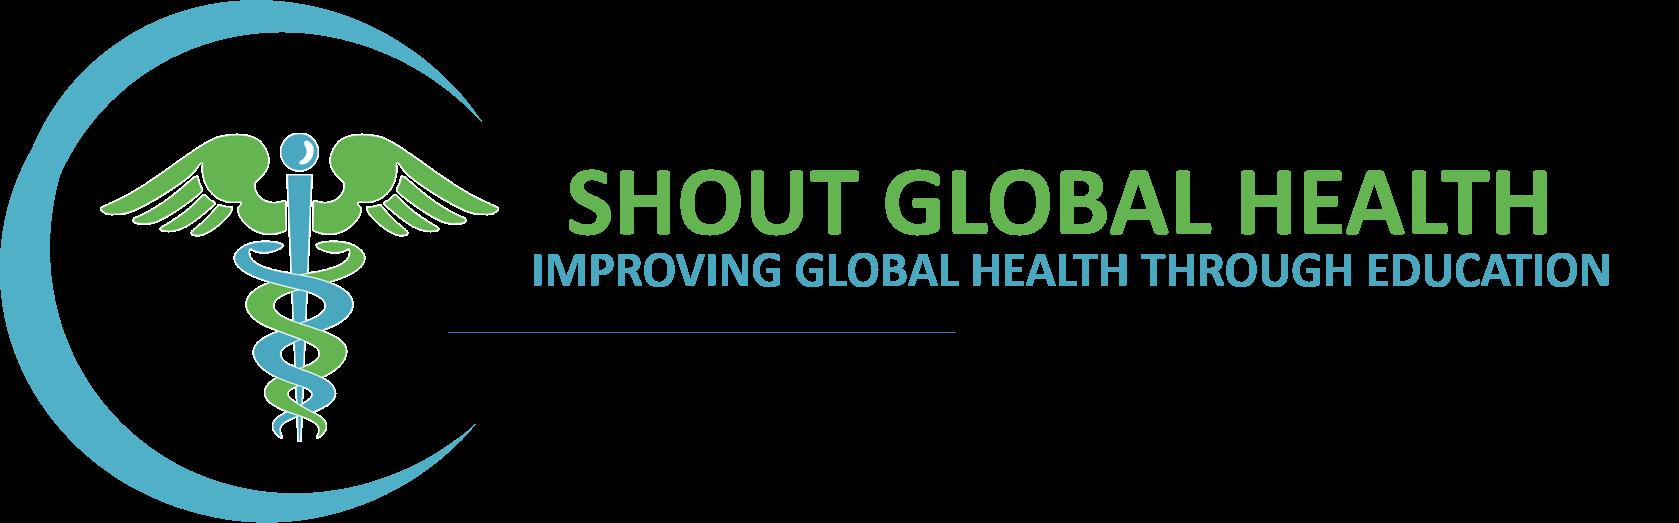 shouthealth